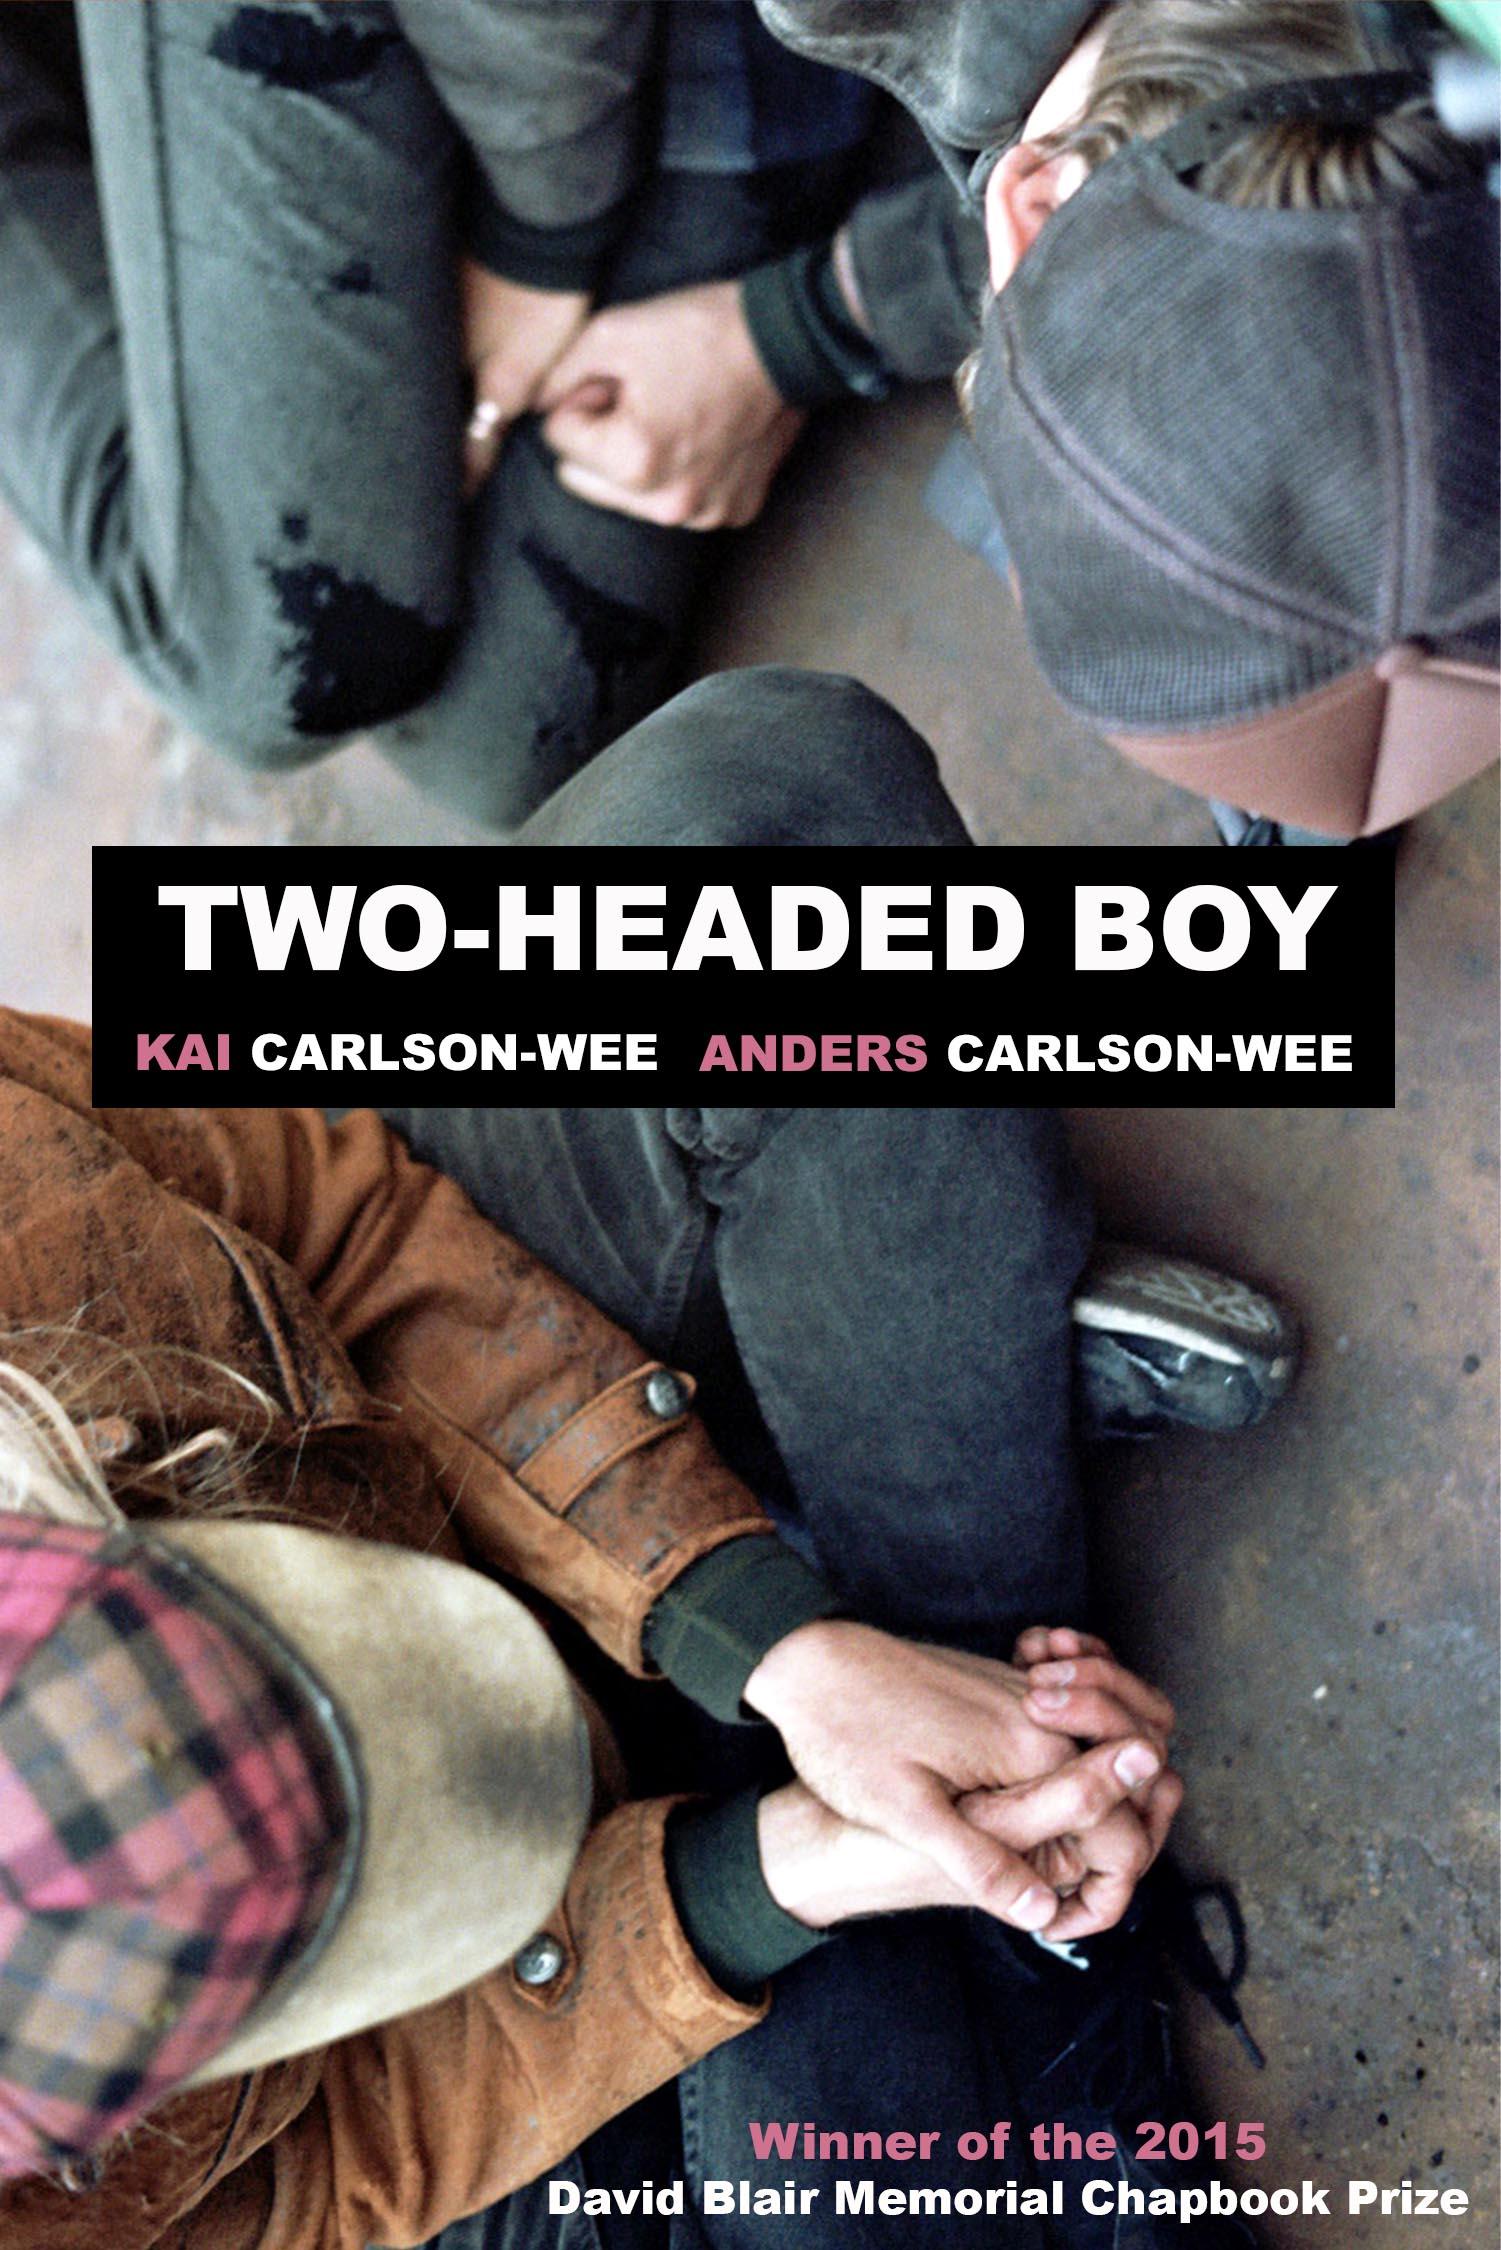 Two-Headed Boy__Cover.jpg